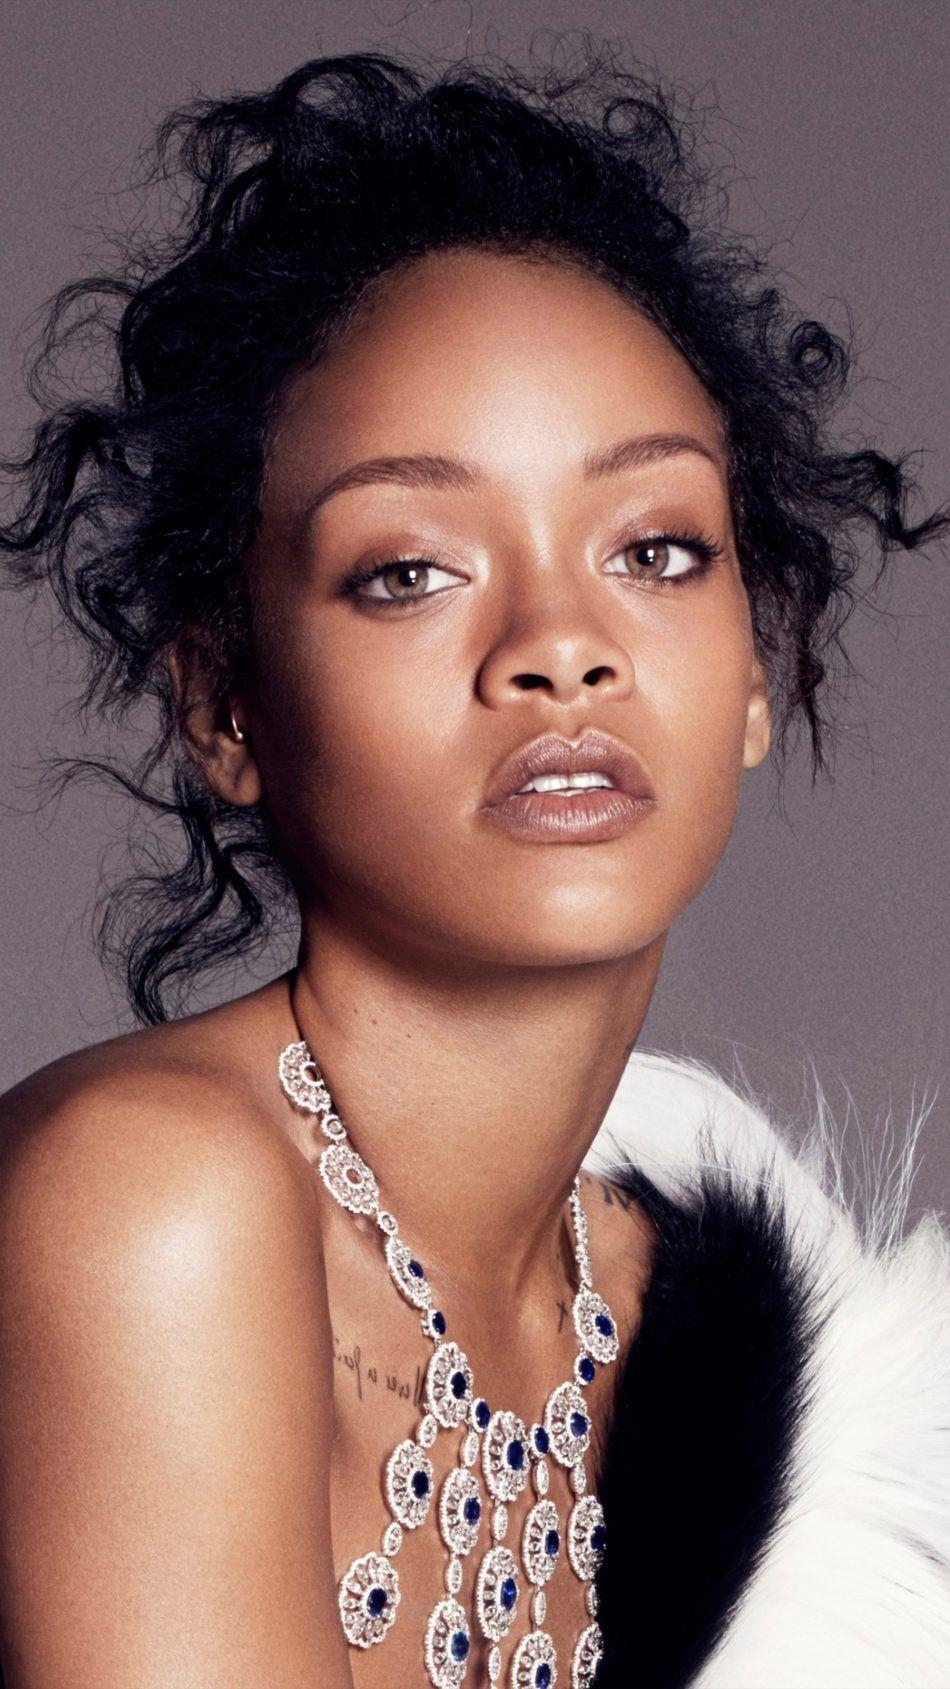 Singer Rihanna 2018 Photoshoot (With images) Rihanna